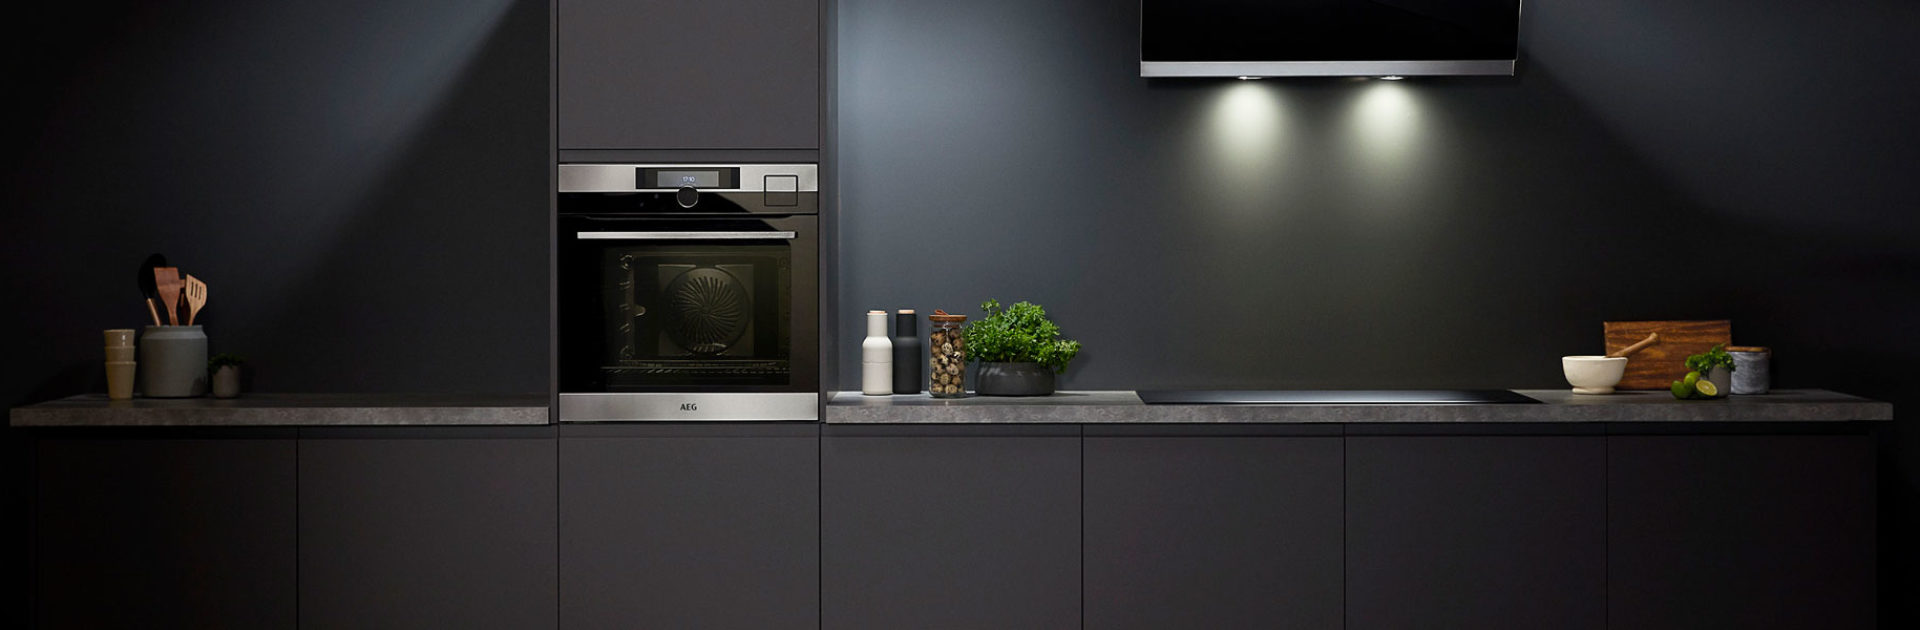 Keuken ontwerpen | KeukenCreator